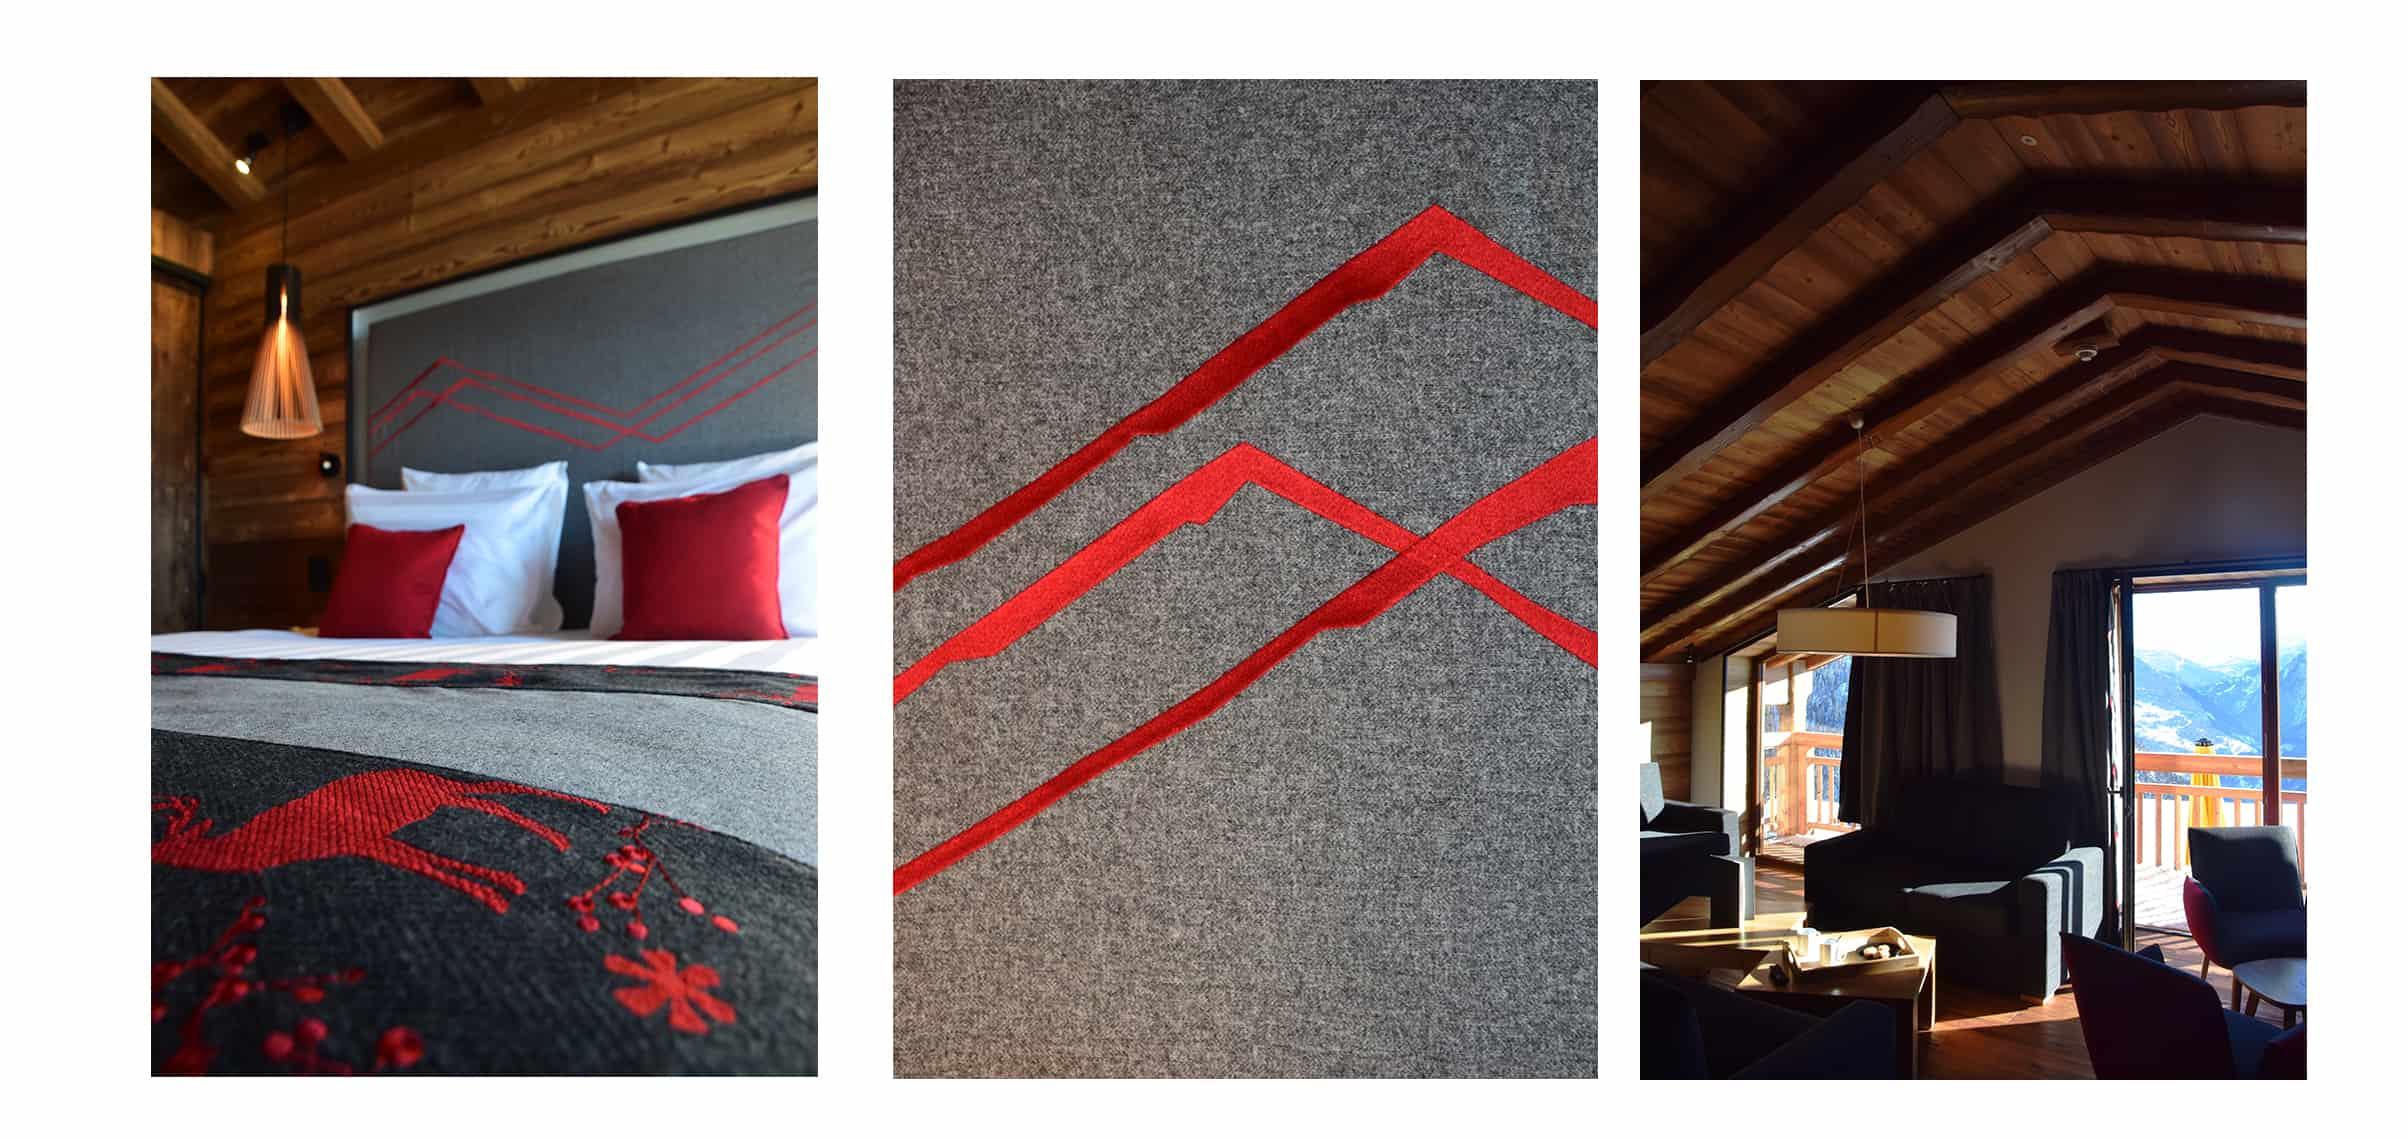 La Rosière Hotel Alparena Chambre rouge